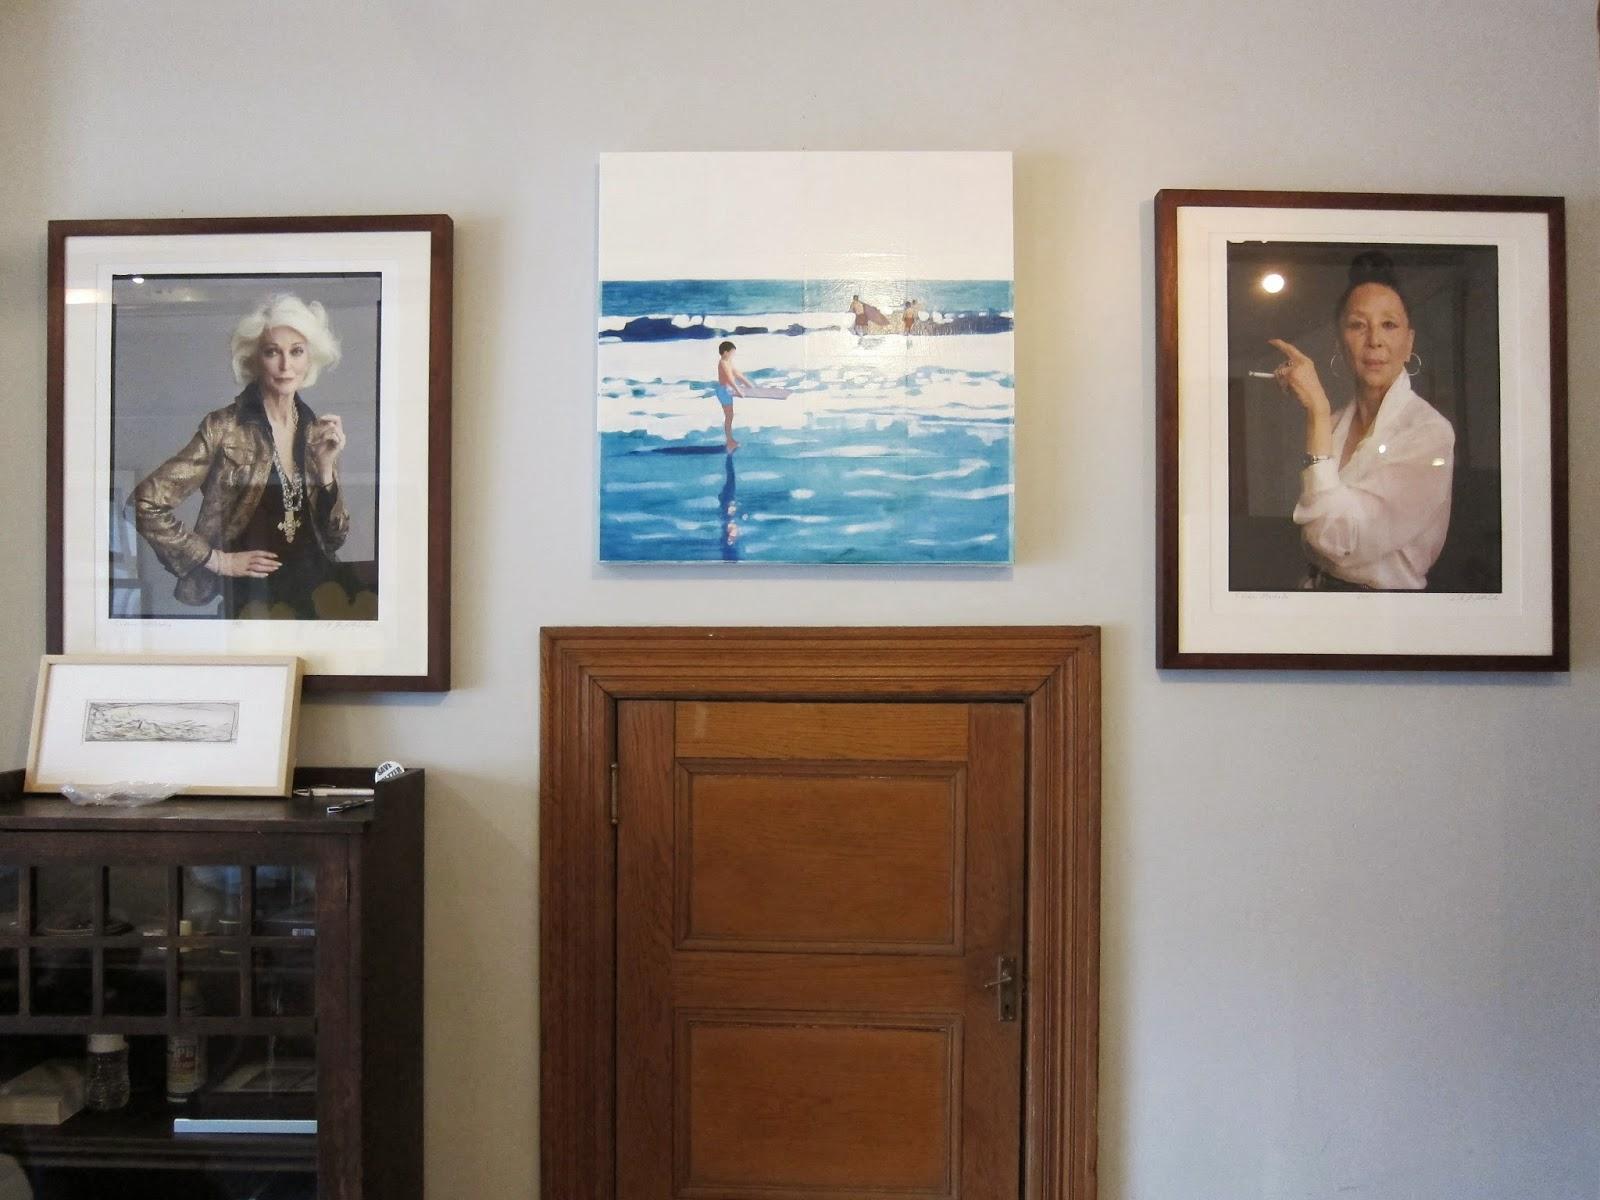 Timothy greenfield sanders pa wetterling gallery